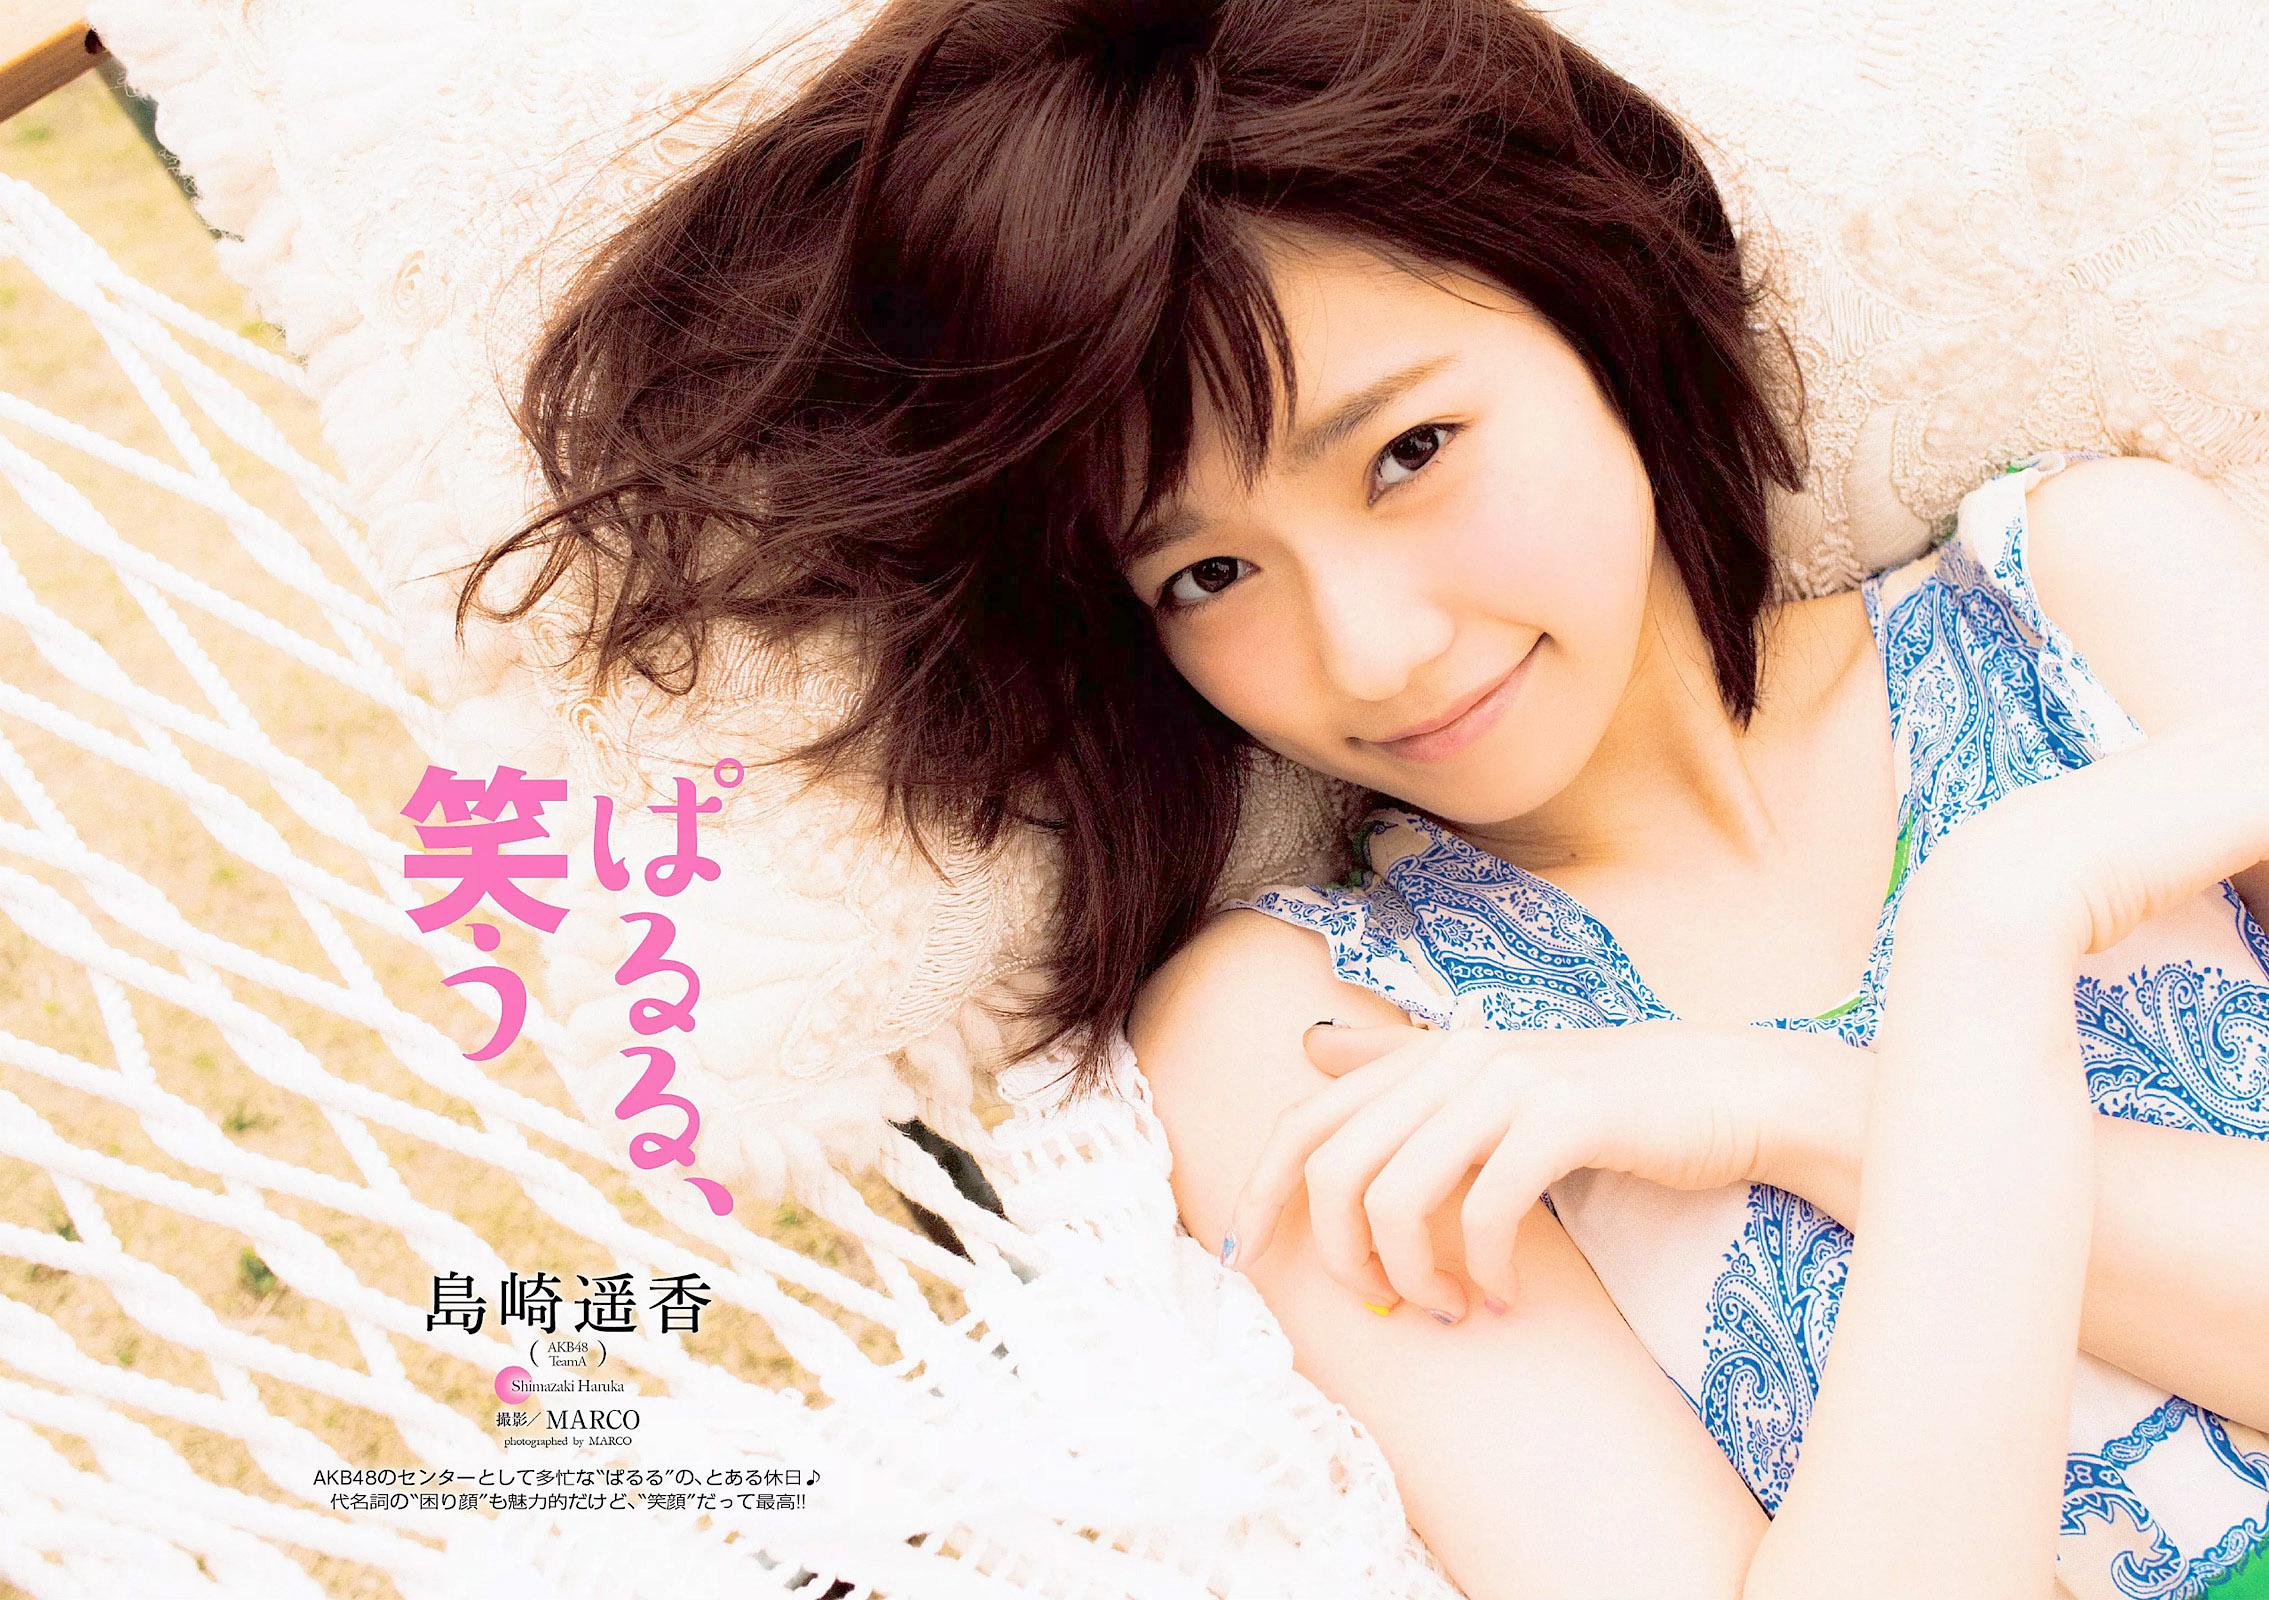 HShimazaki WPB 150615 03.jpg